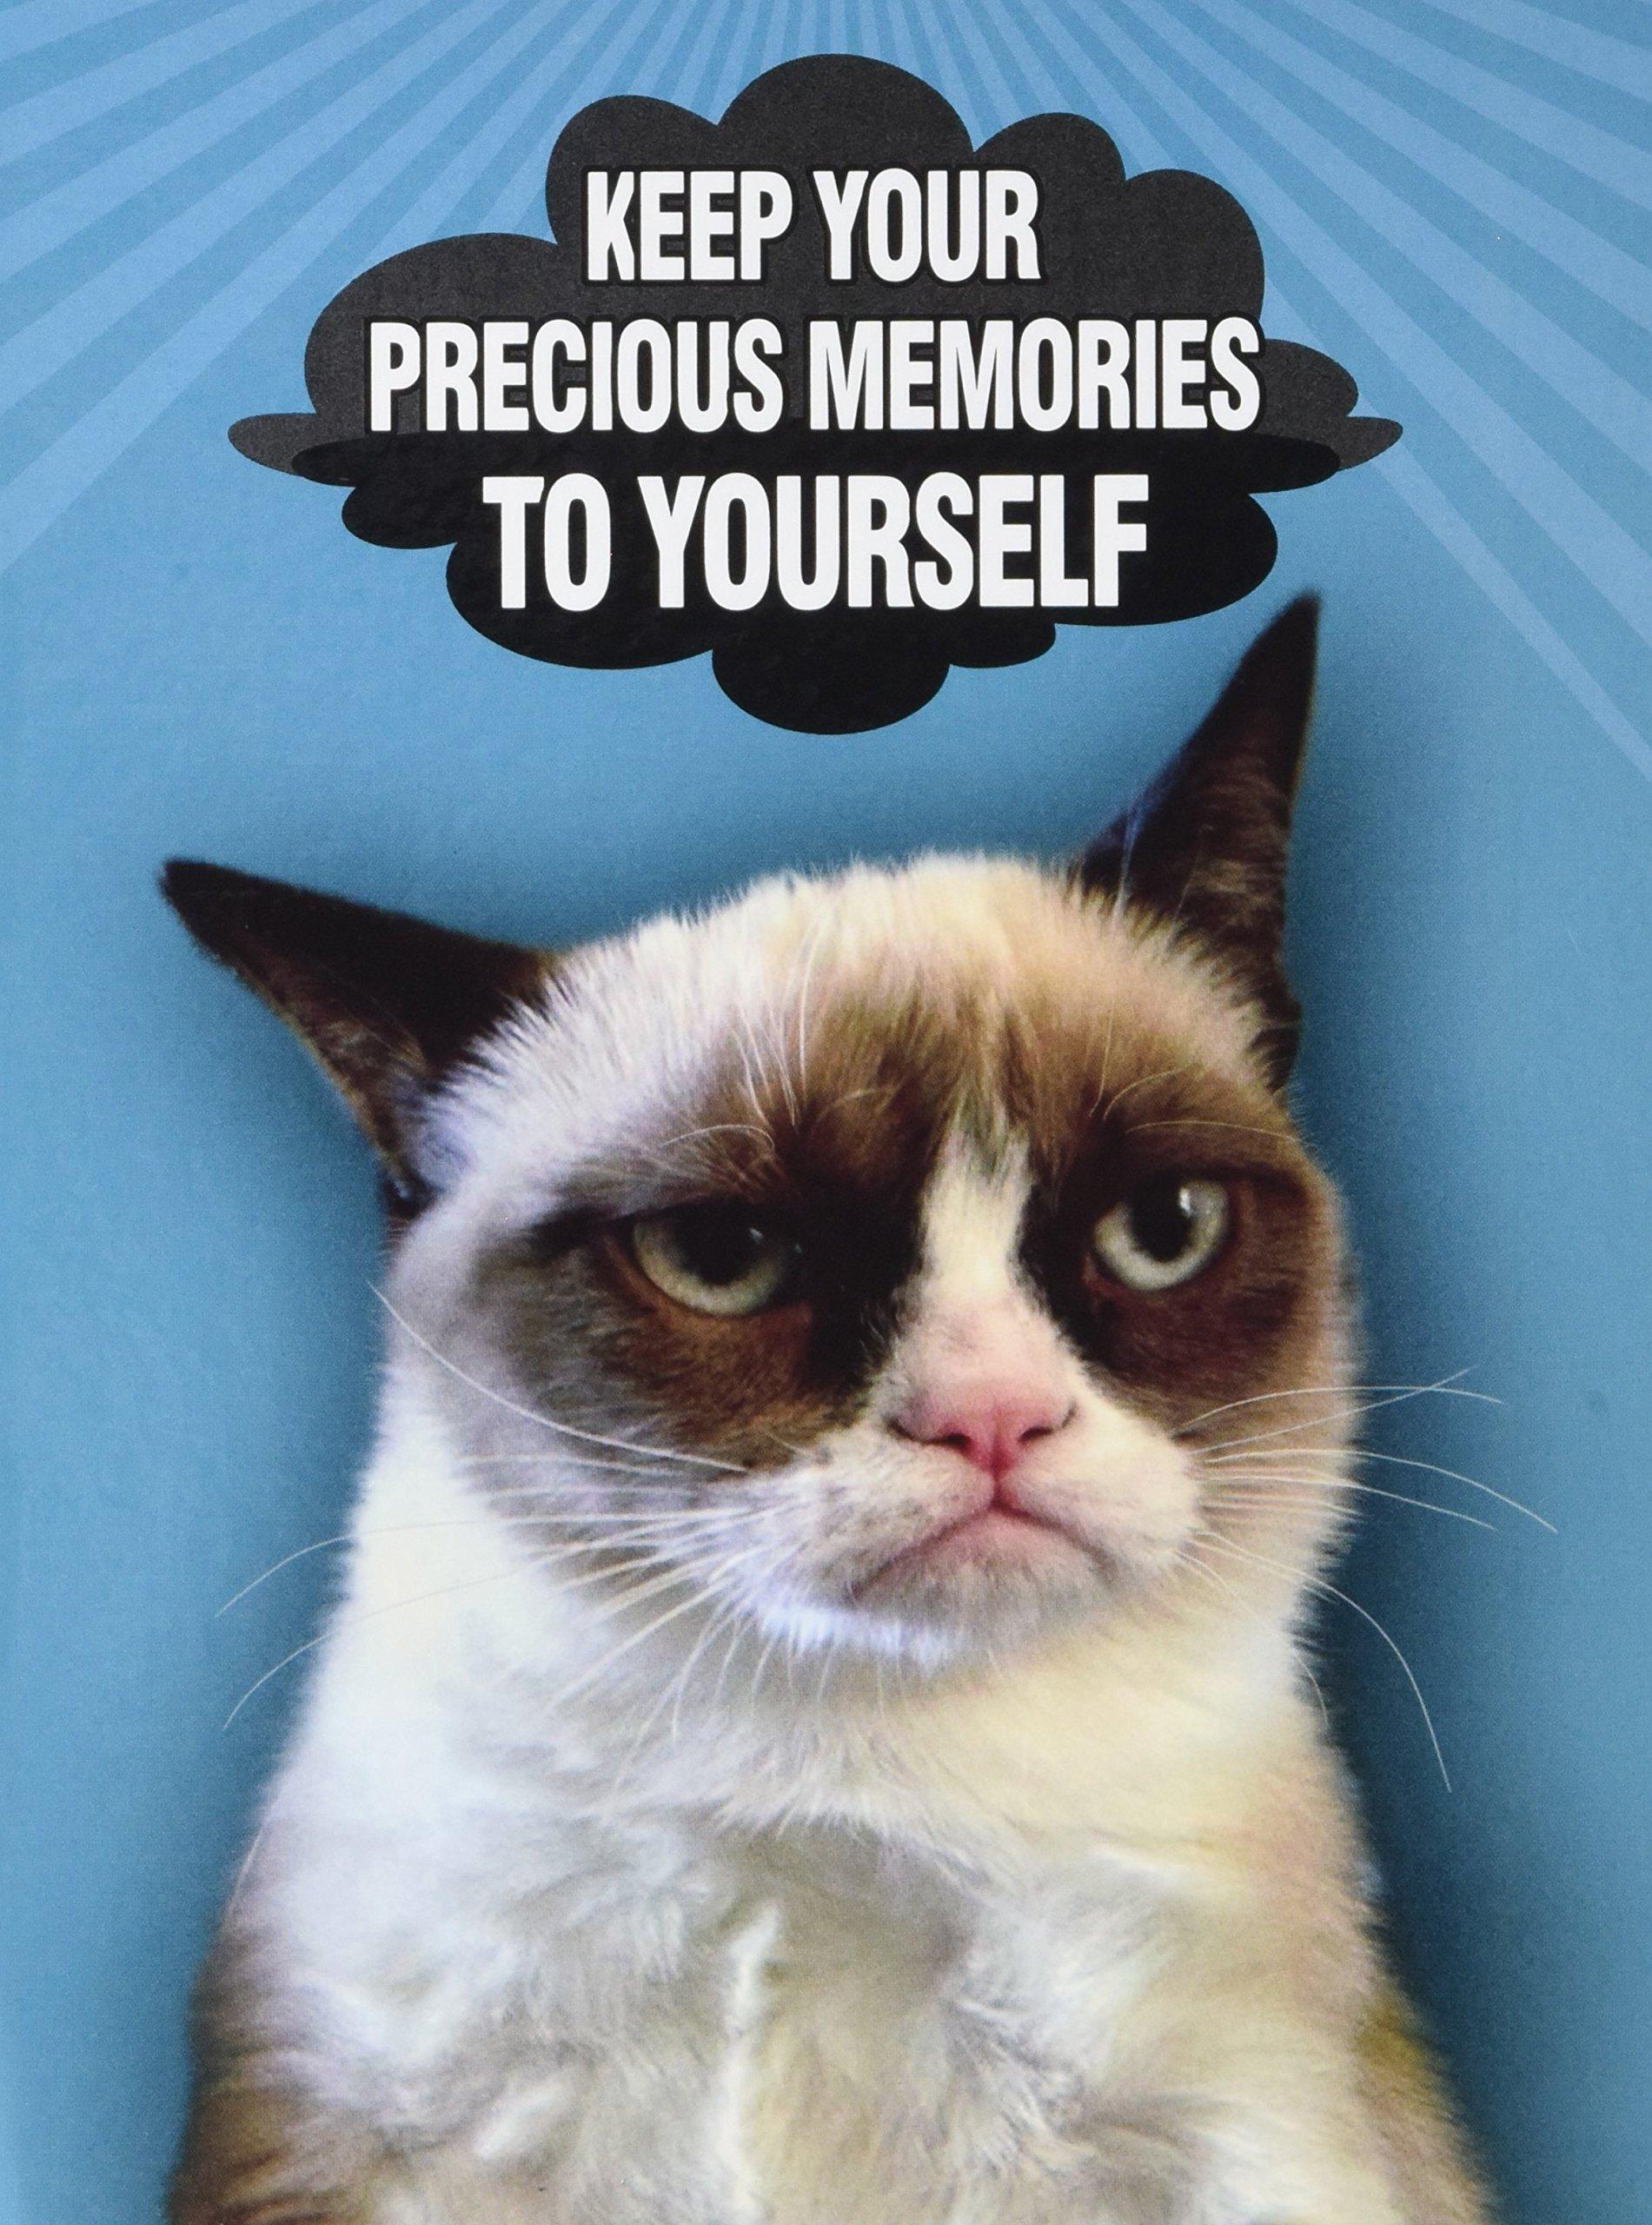 Ultra PRO 58207-R Grumpy Cat Mini Photo Album, 4 by 6-Inch, Memories